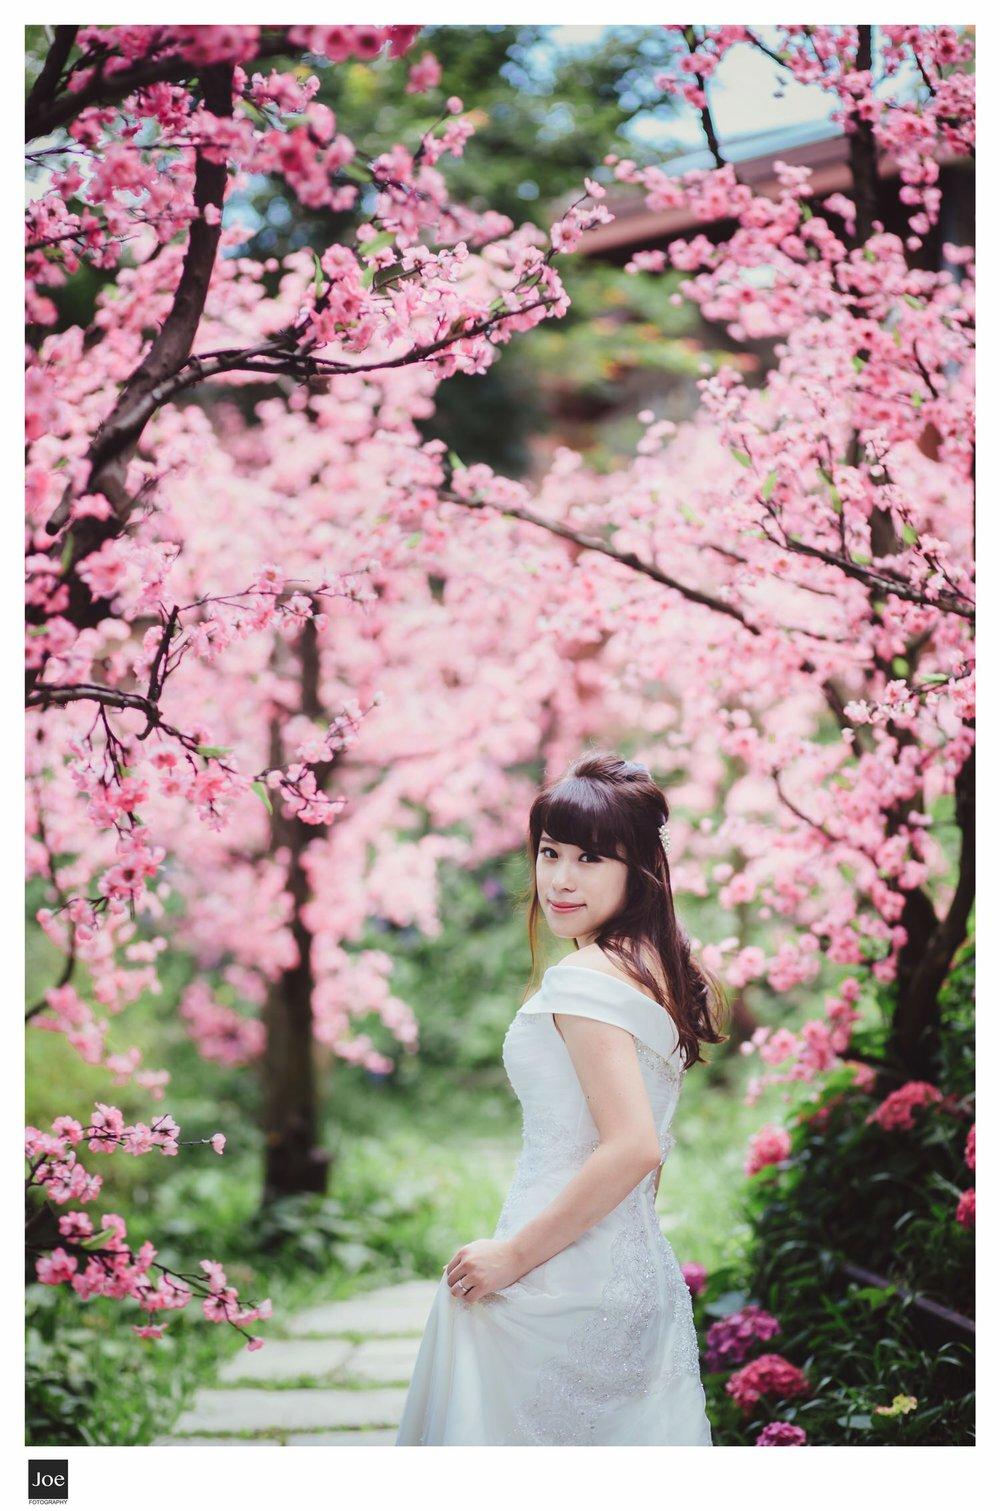 taiwan-pre-wedding-roger-wing-joe-fotography-008.jpg